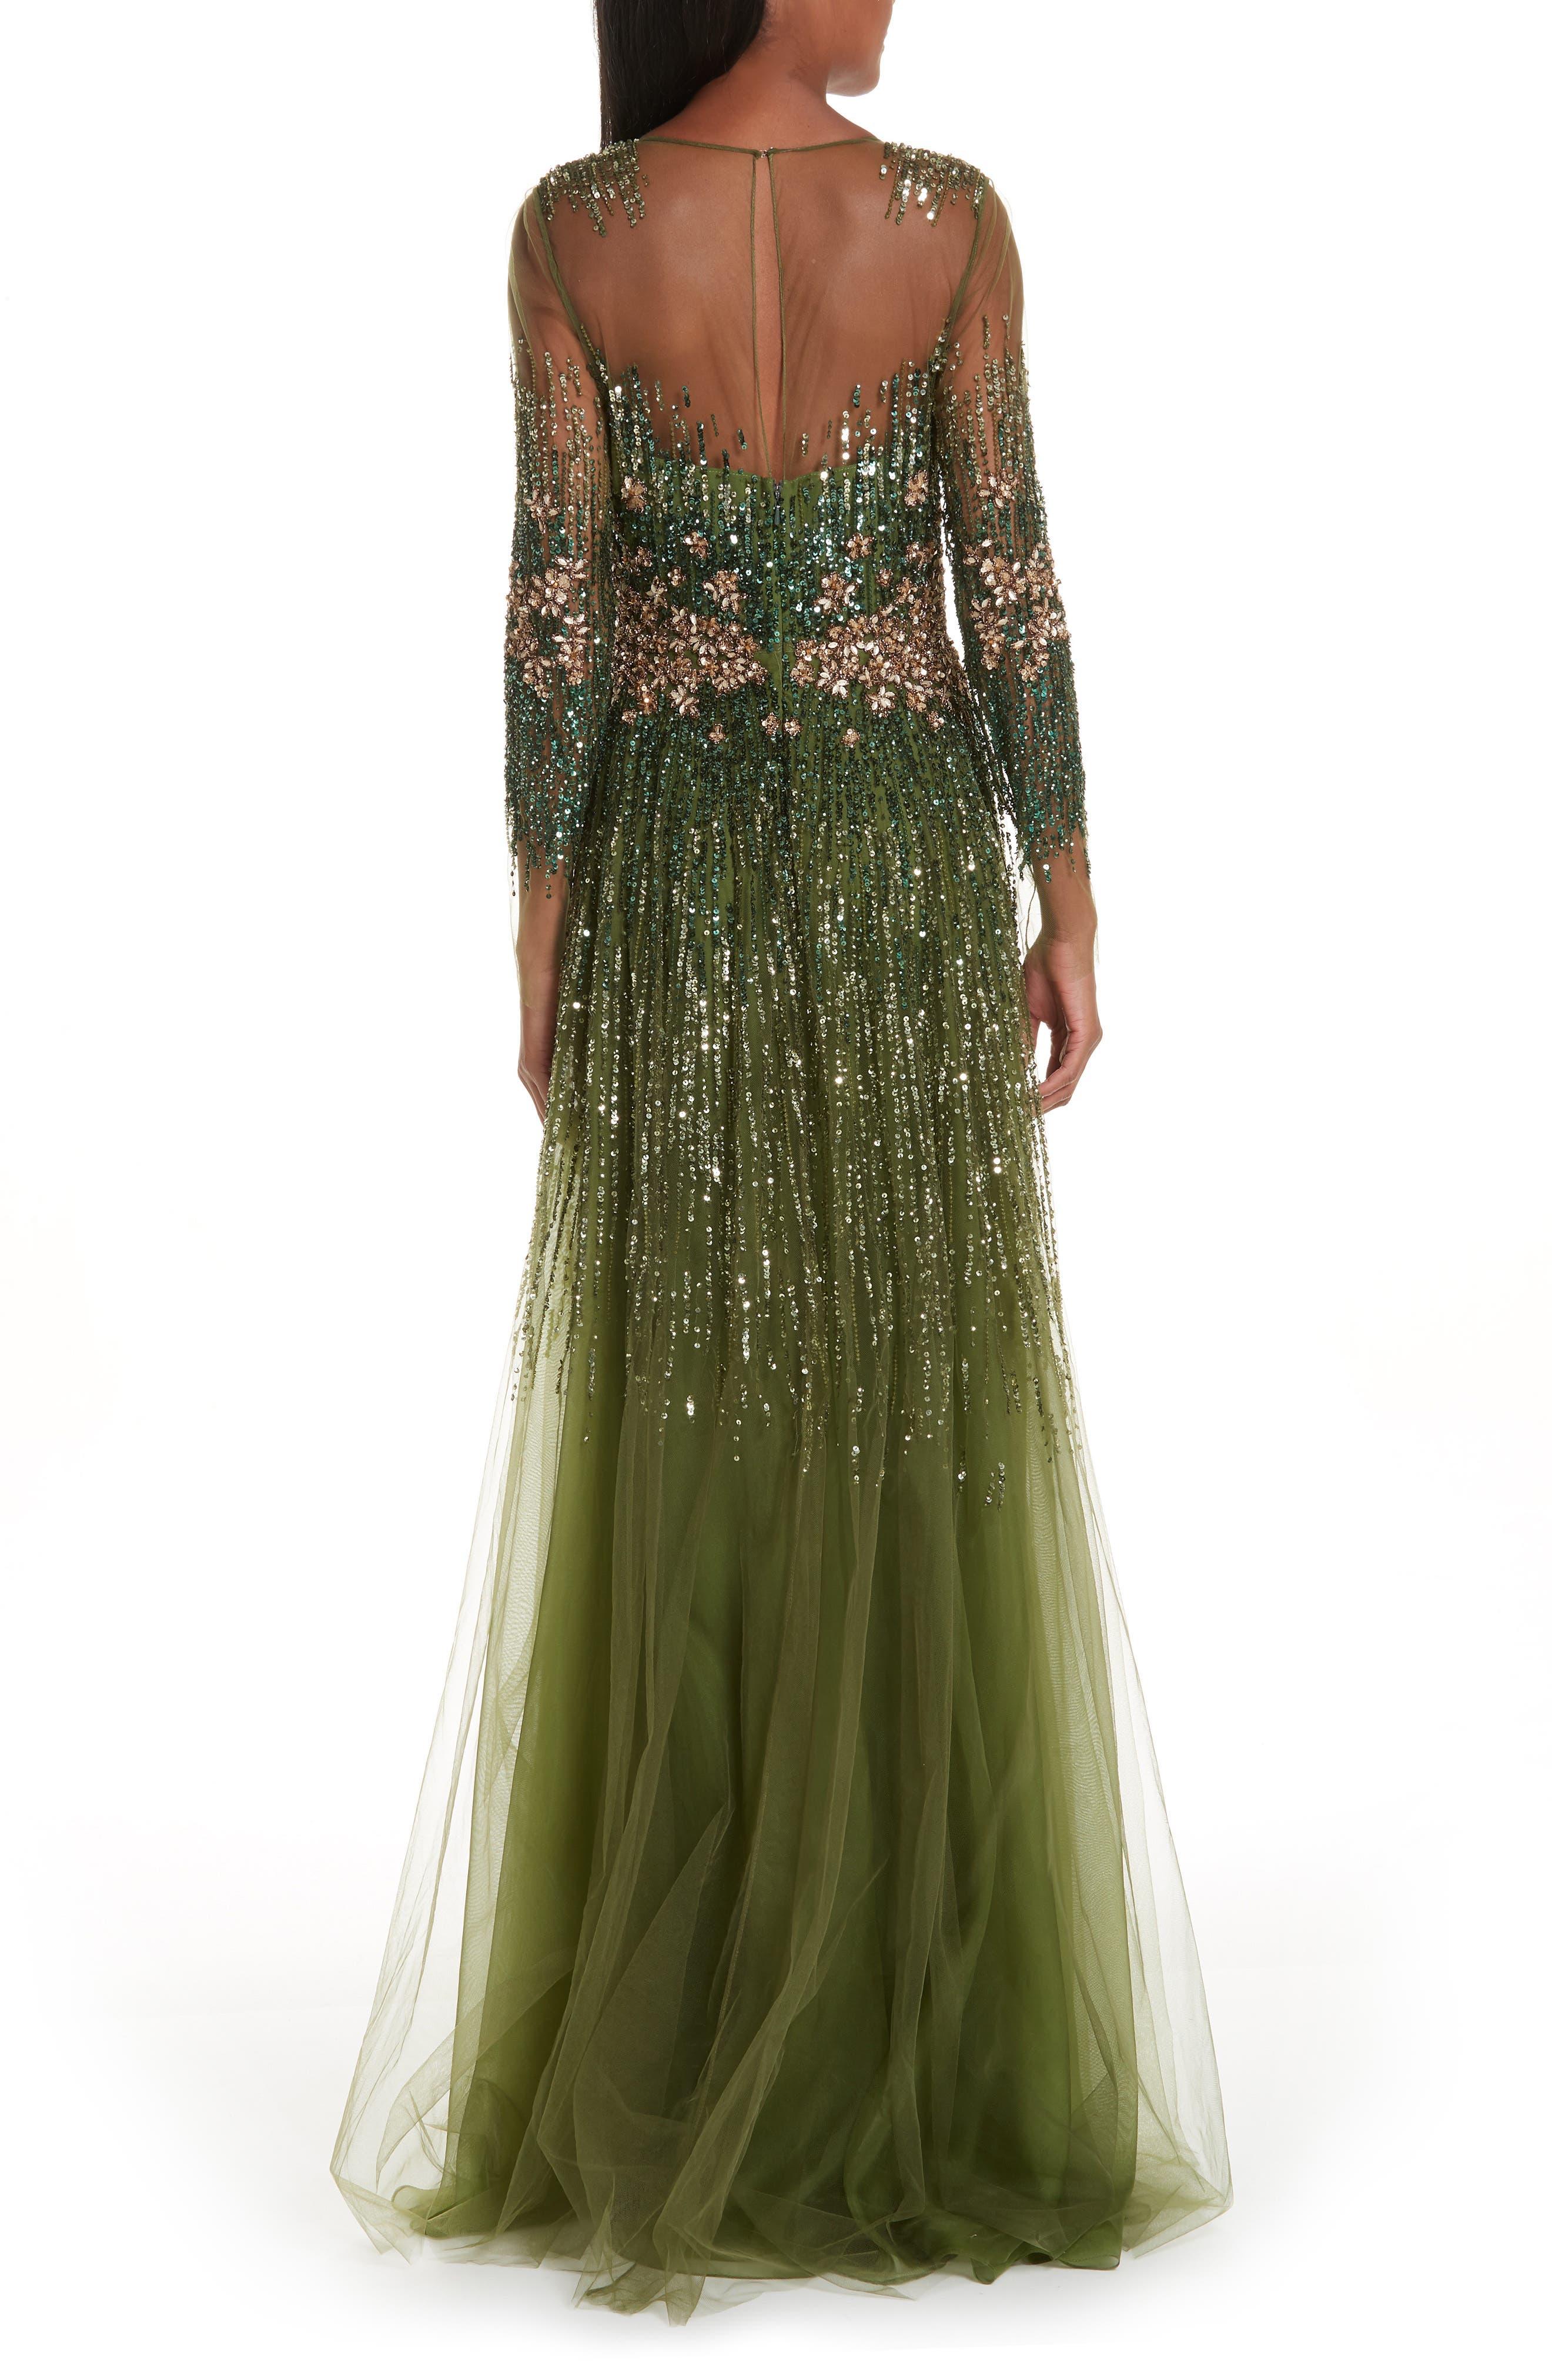 PAMELLA ROLAND, Crystal Embellished A-Line Gown, Alternate thumbnail 2, color, SAGE MULTI